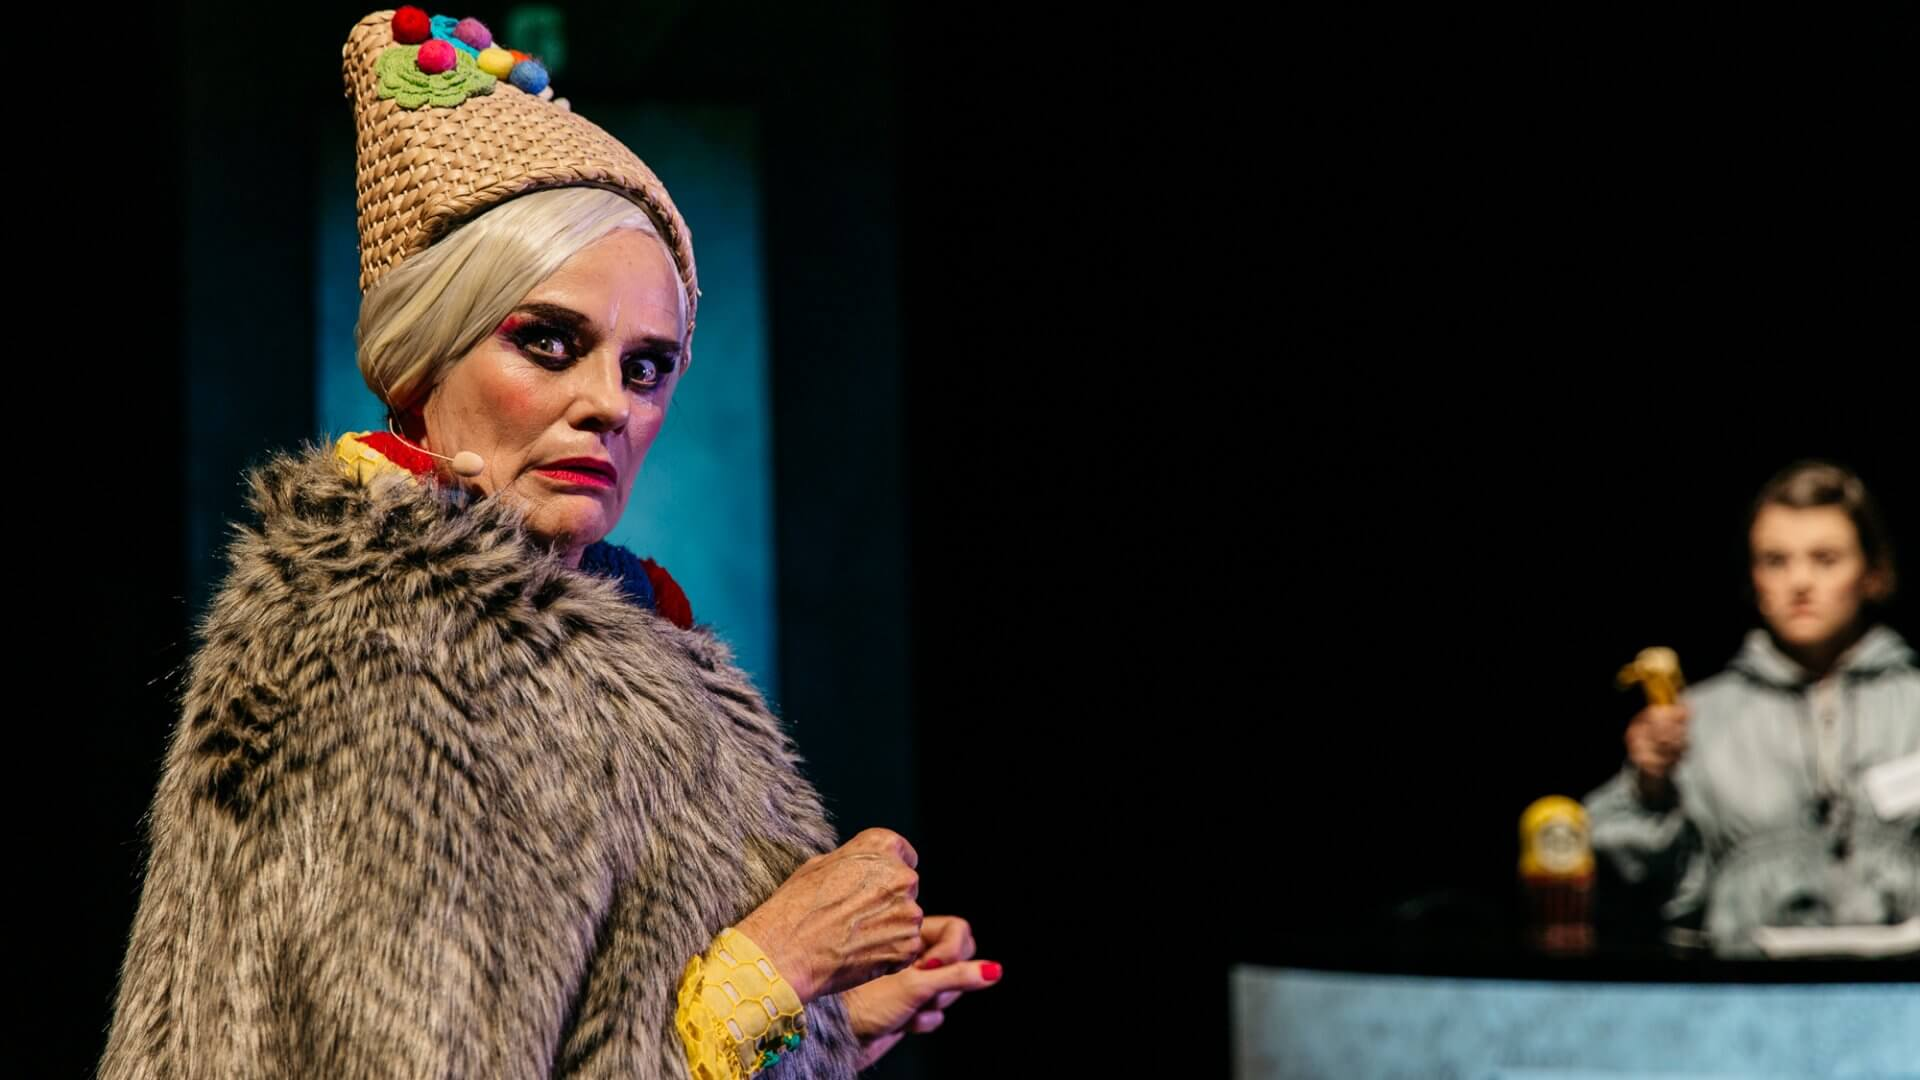 Christine Johnston and the weird and wonderful Baba Yaga